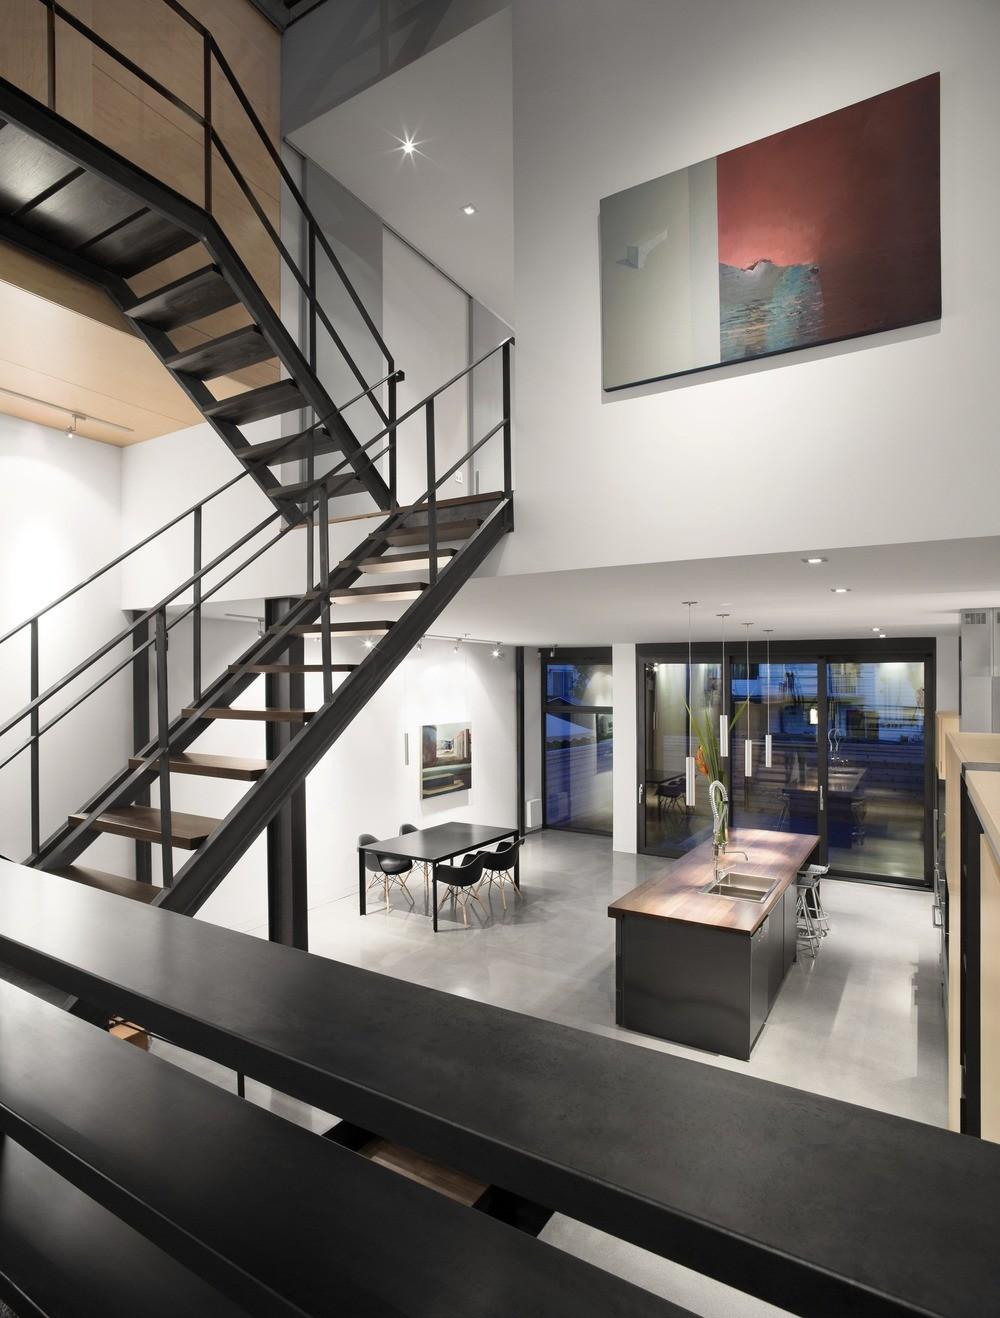 Gallery of maison e3 natalie dionne 10 - Canada maison close ...